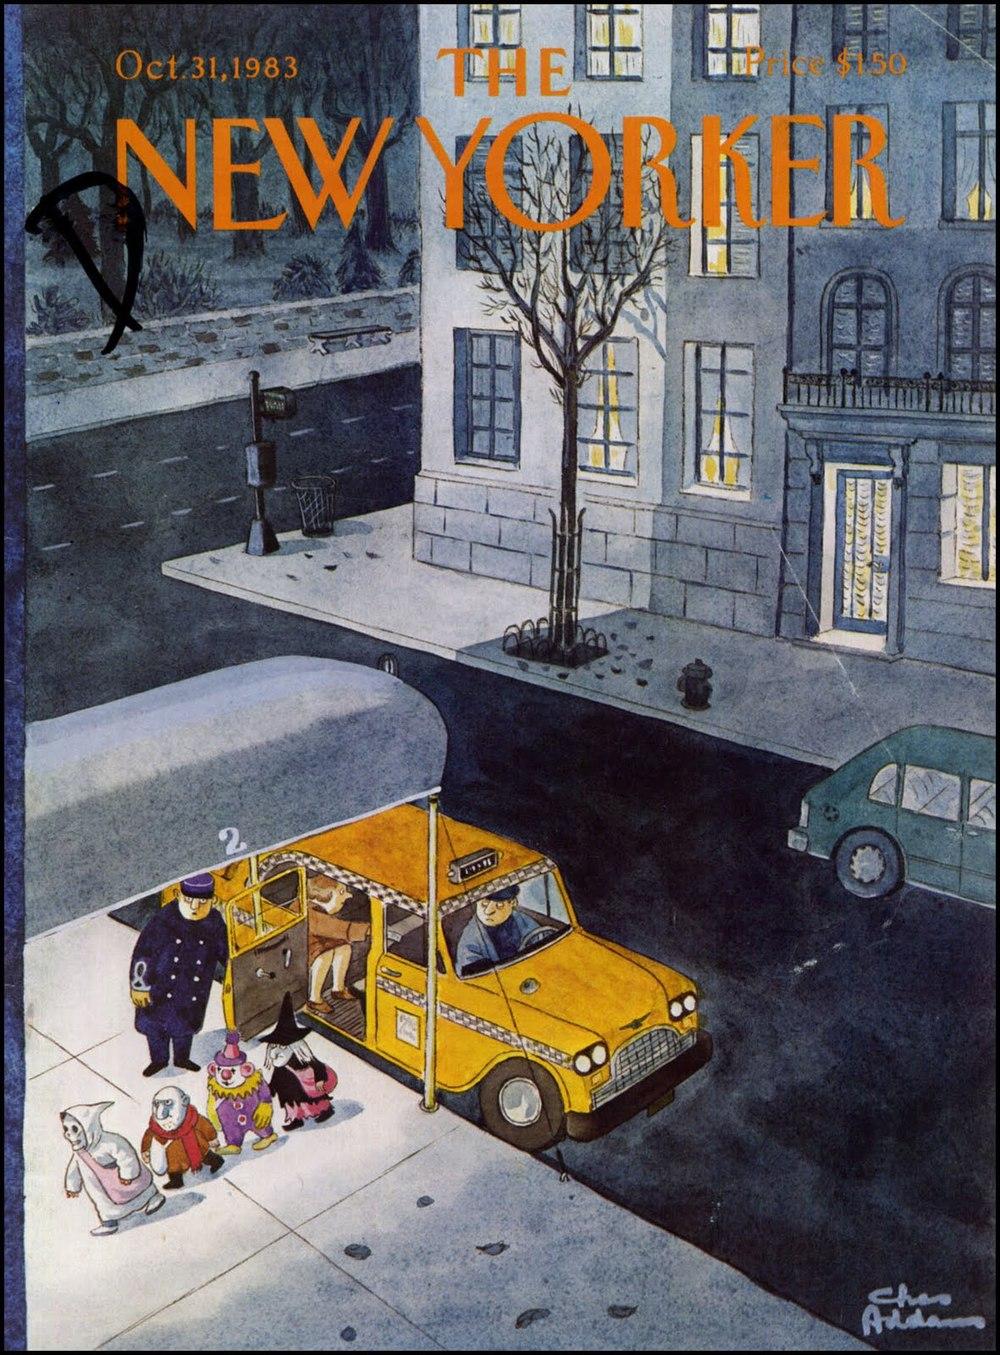 Charles Addams New Yorker, Oct. 31, 1983